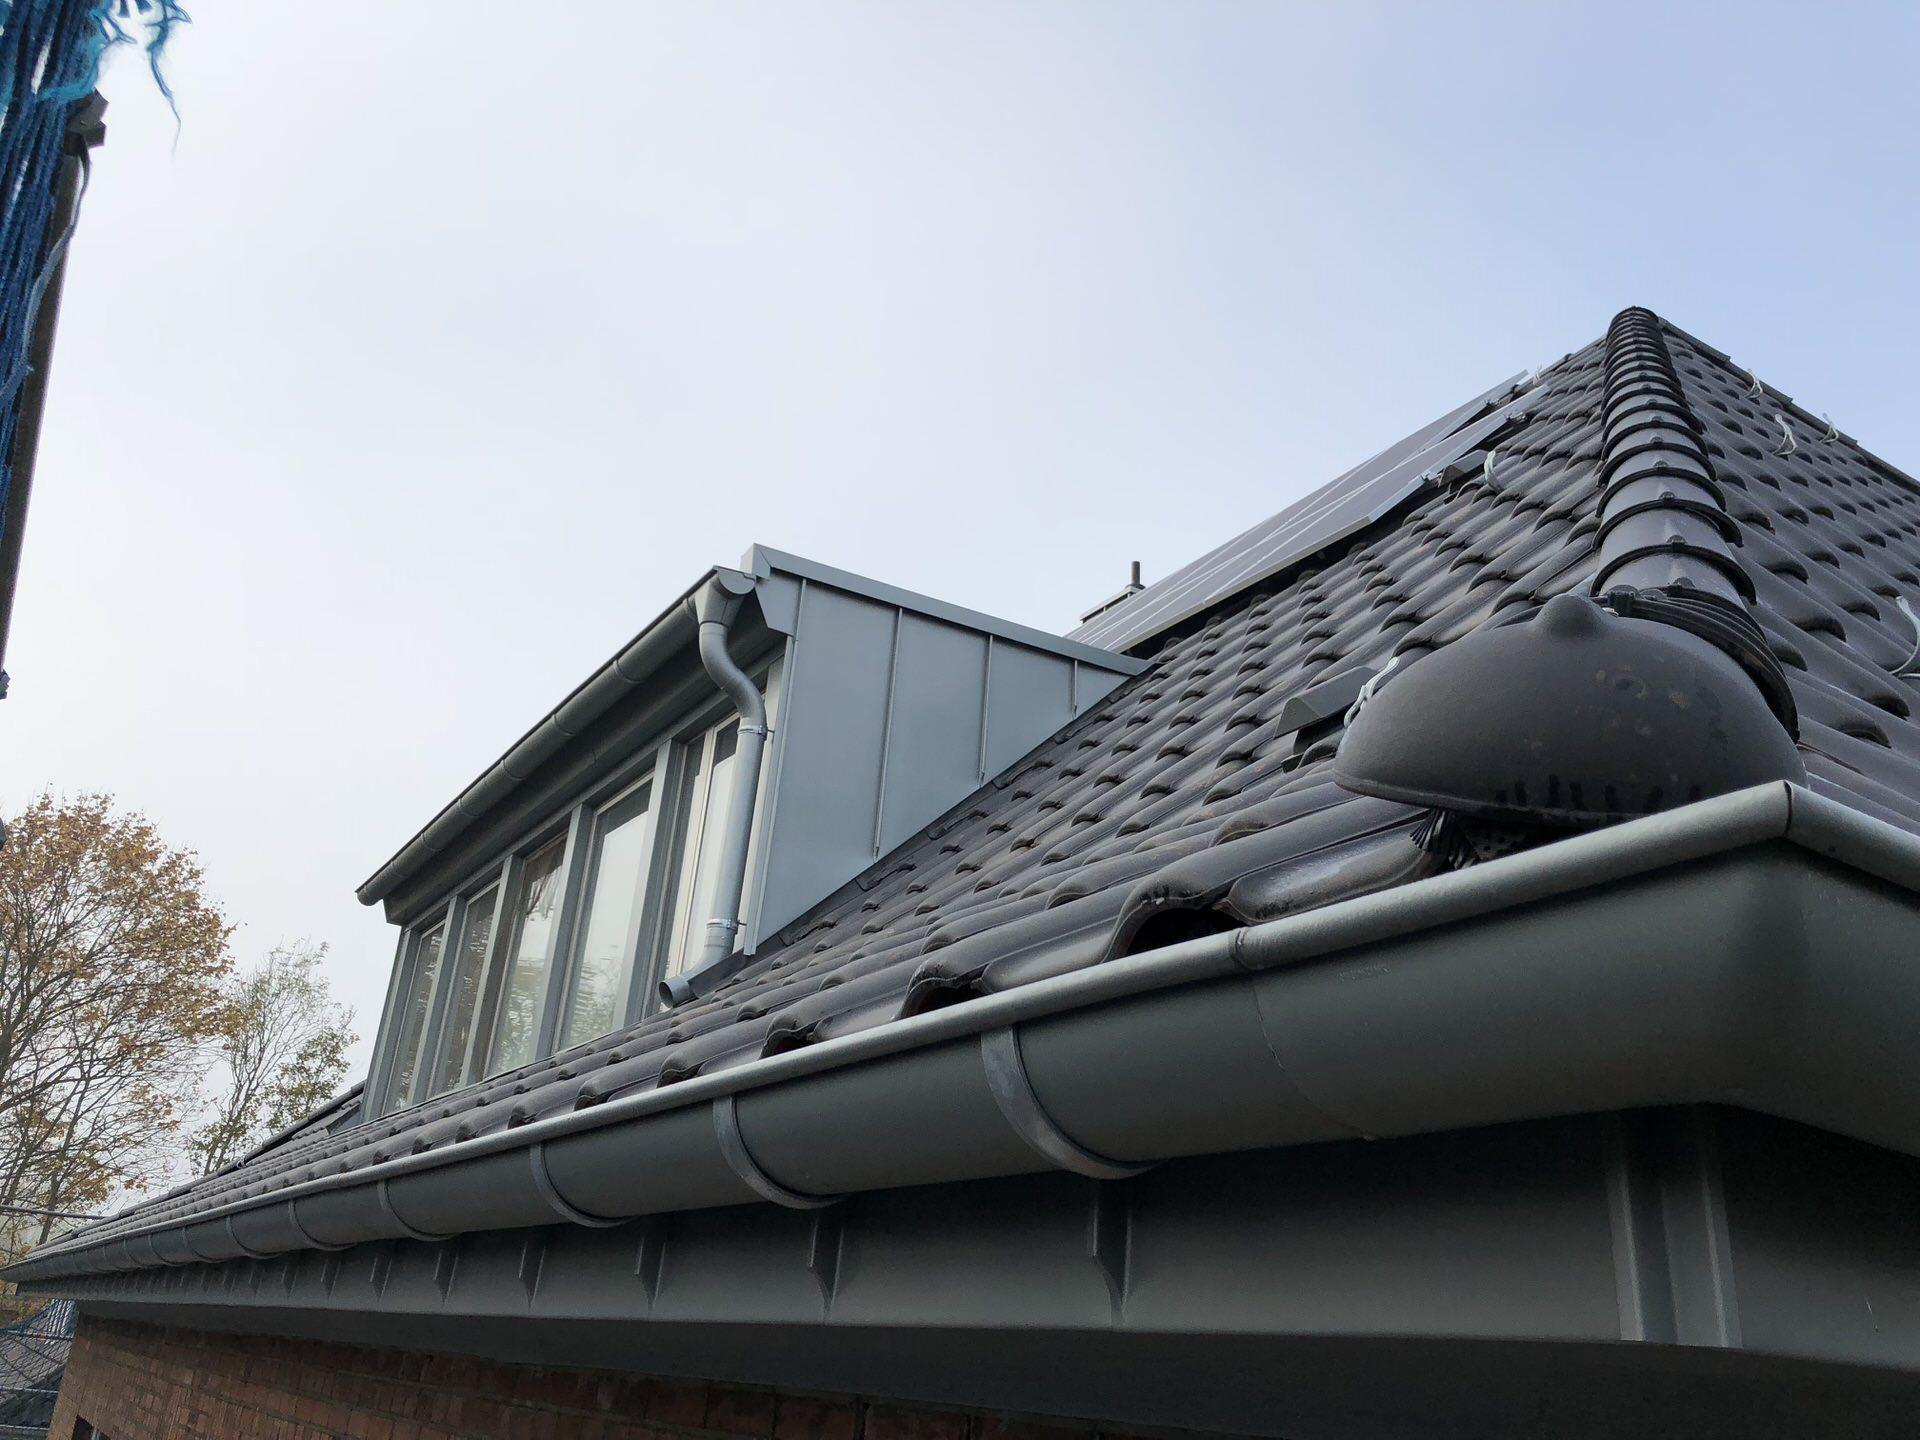 Dachklempnerei in Wesel - Schnickers Bedachungen